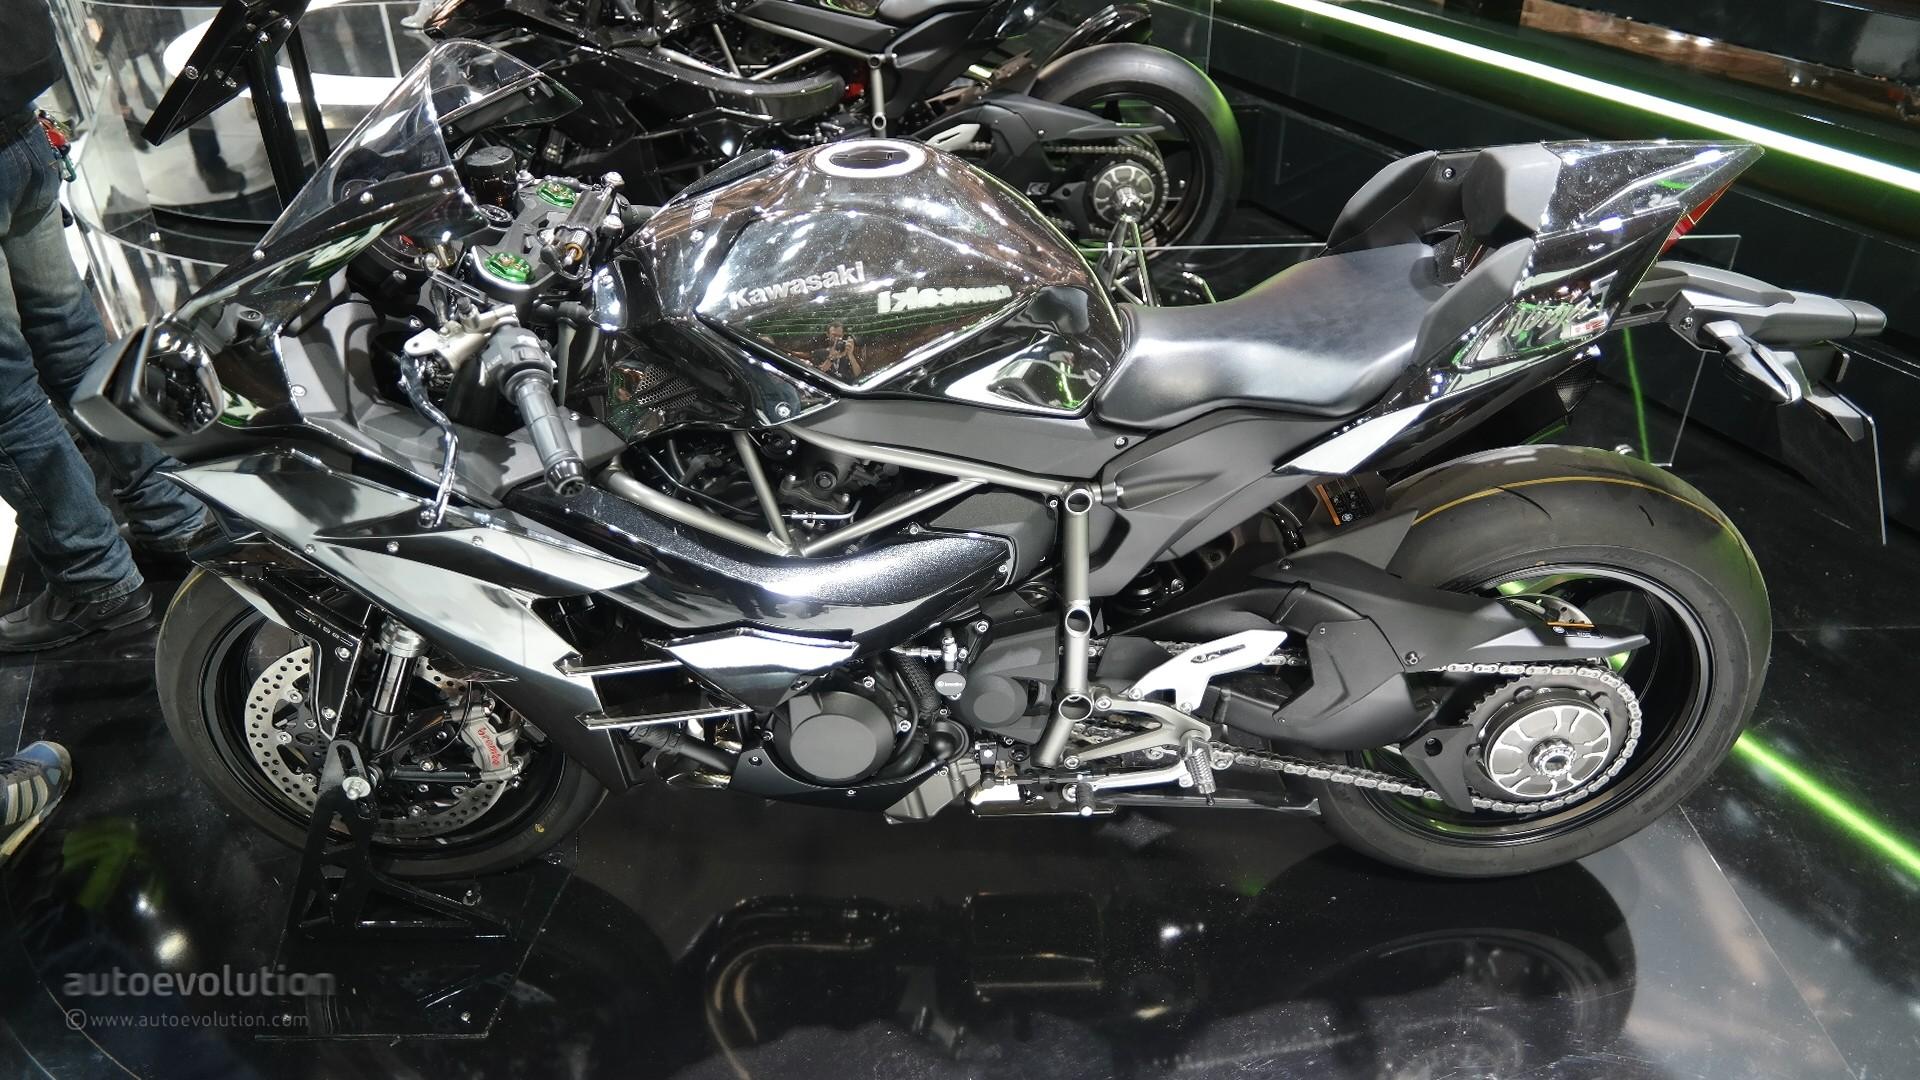 2016 kawasaki ninja h2 seen from up-close, priced - autoevolution